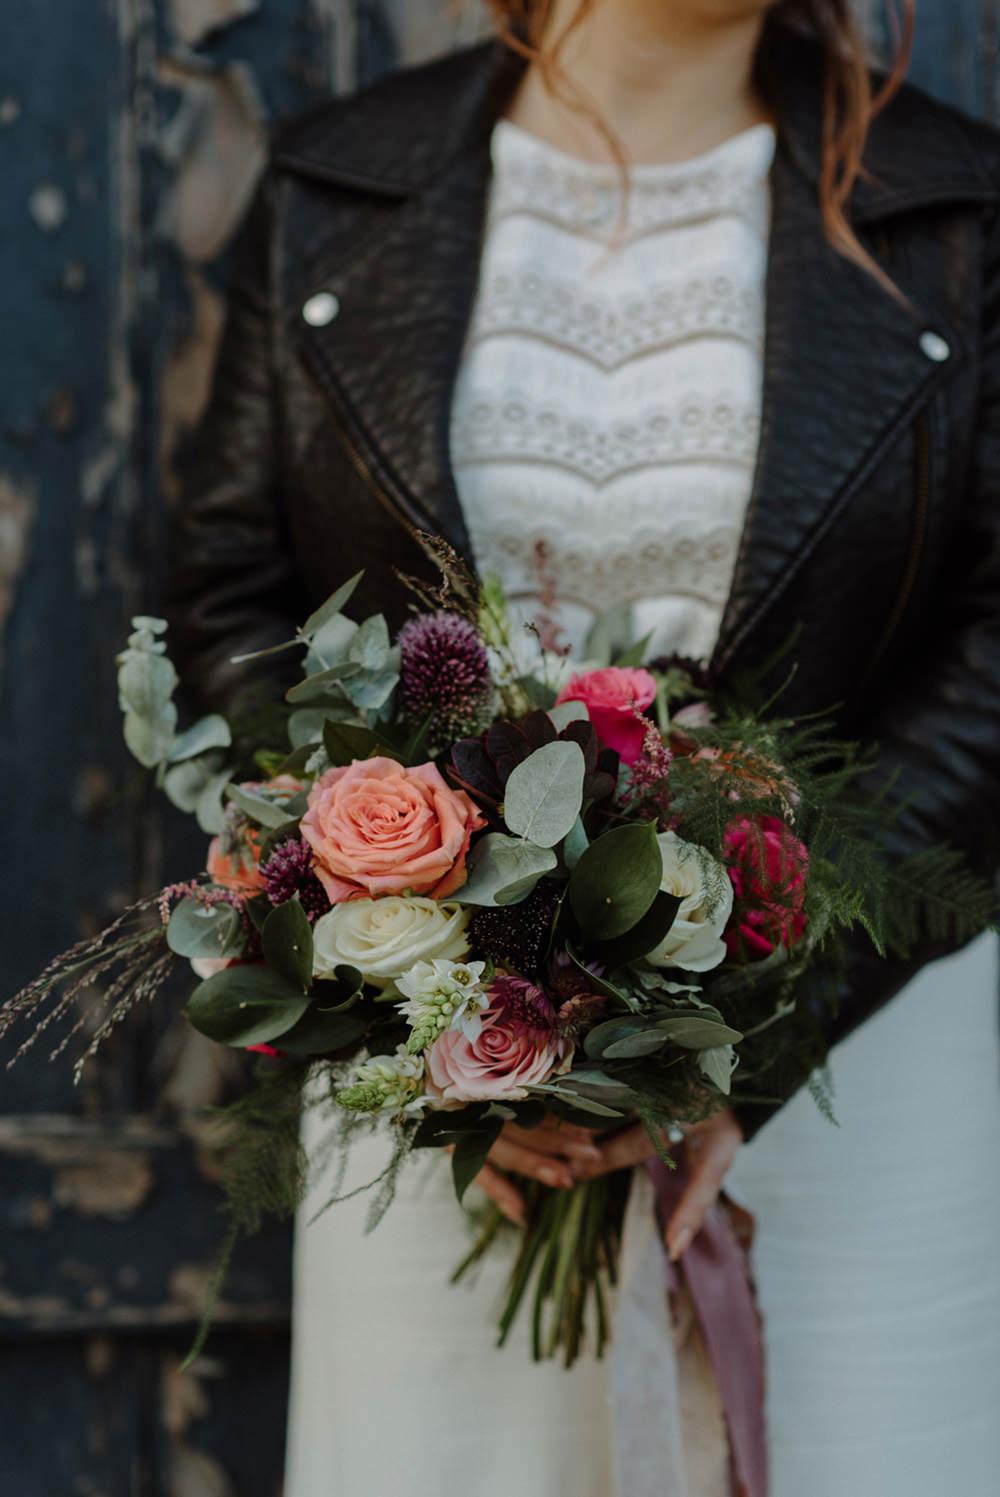 Bride Bridal Bouquet Foliage Eucalyptus Peach Rose Pink Felin Newydd House Wedding Christopherian.co.uk